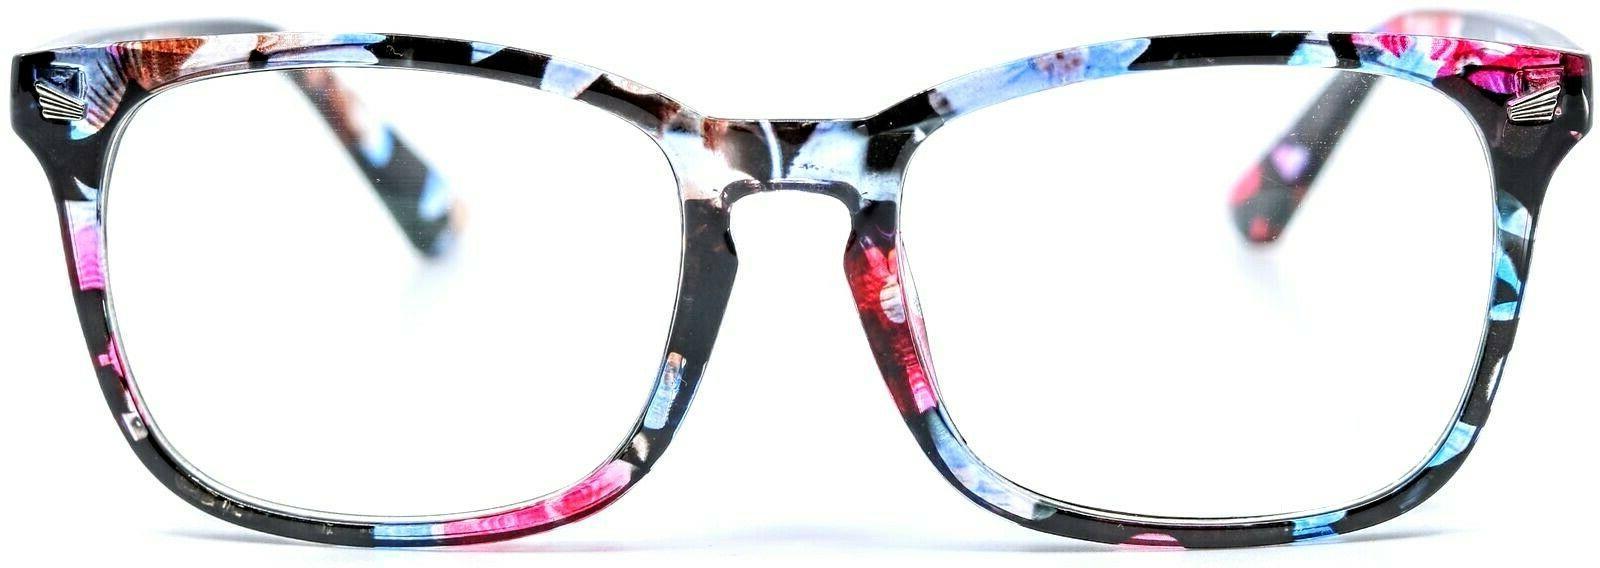 Agstum C155 Flowers Square Eyeglasses